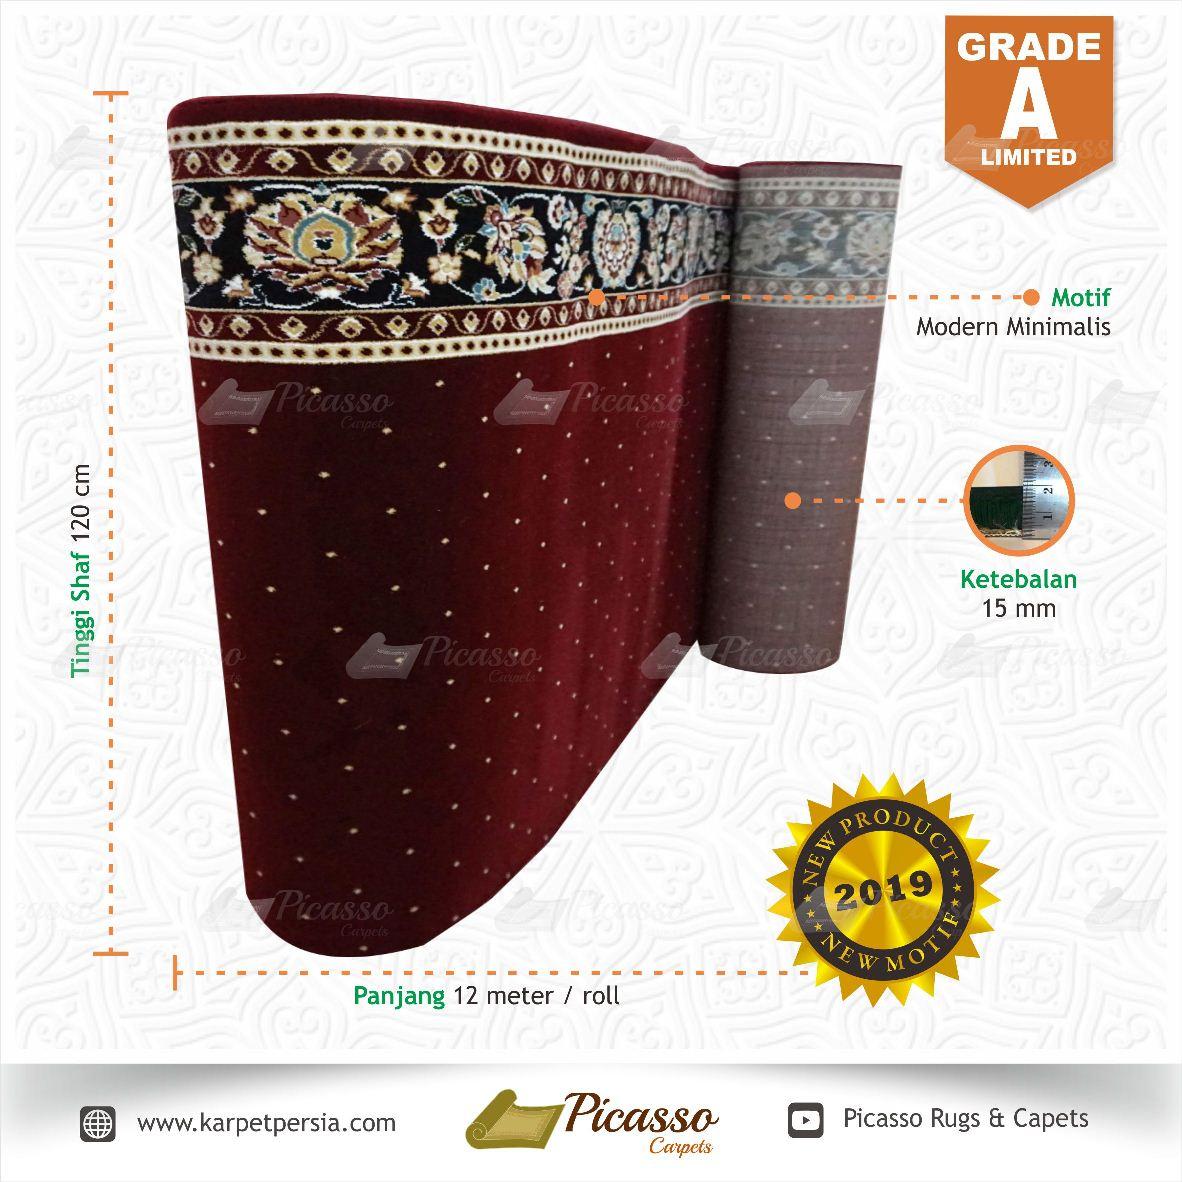 Karpet Masjid - Grade A Limited